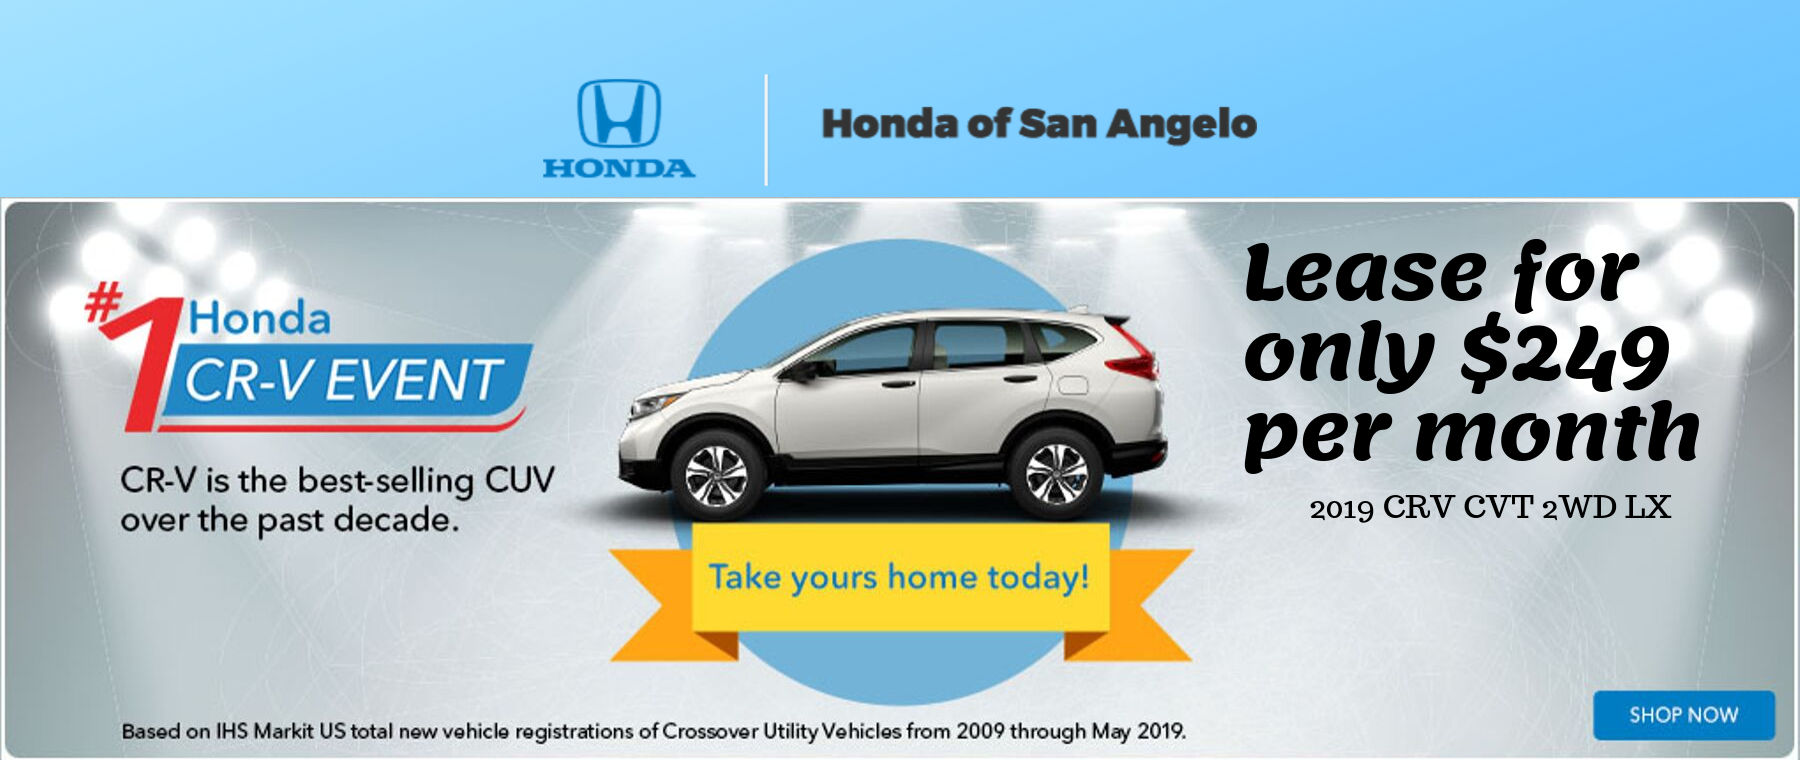 Honda CR-V Event - Lease for $249 per month